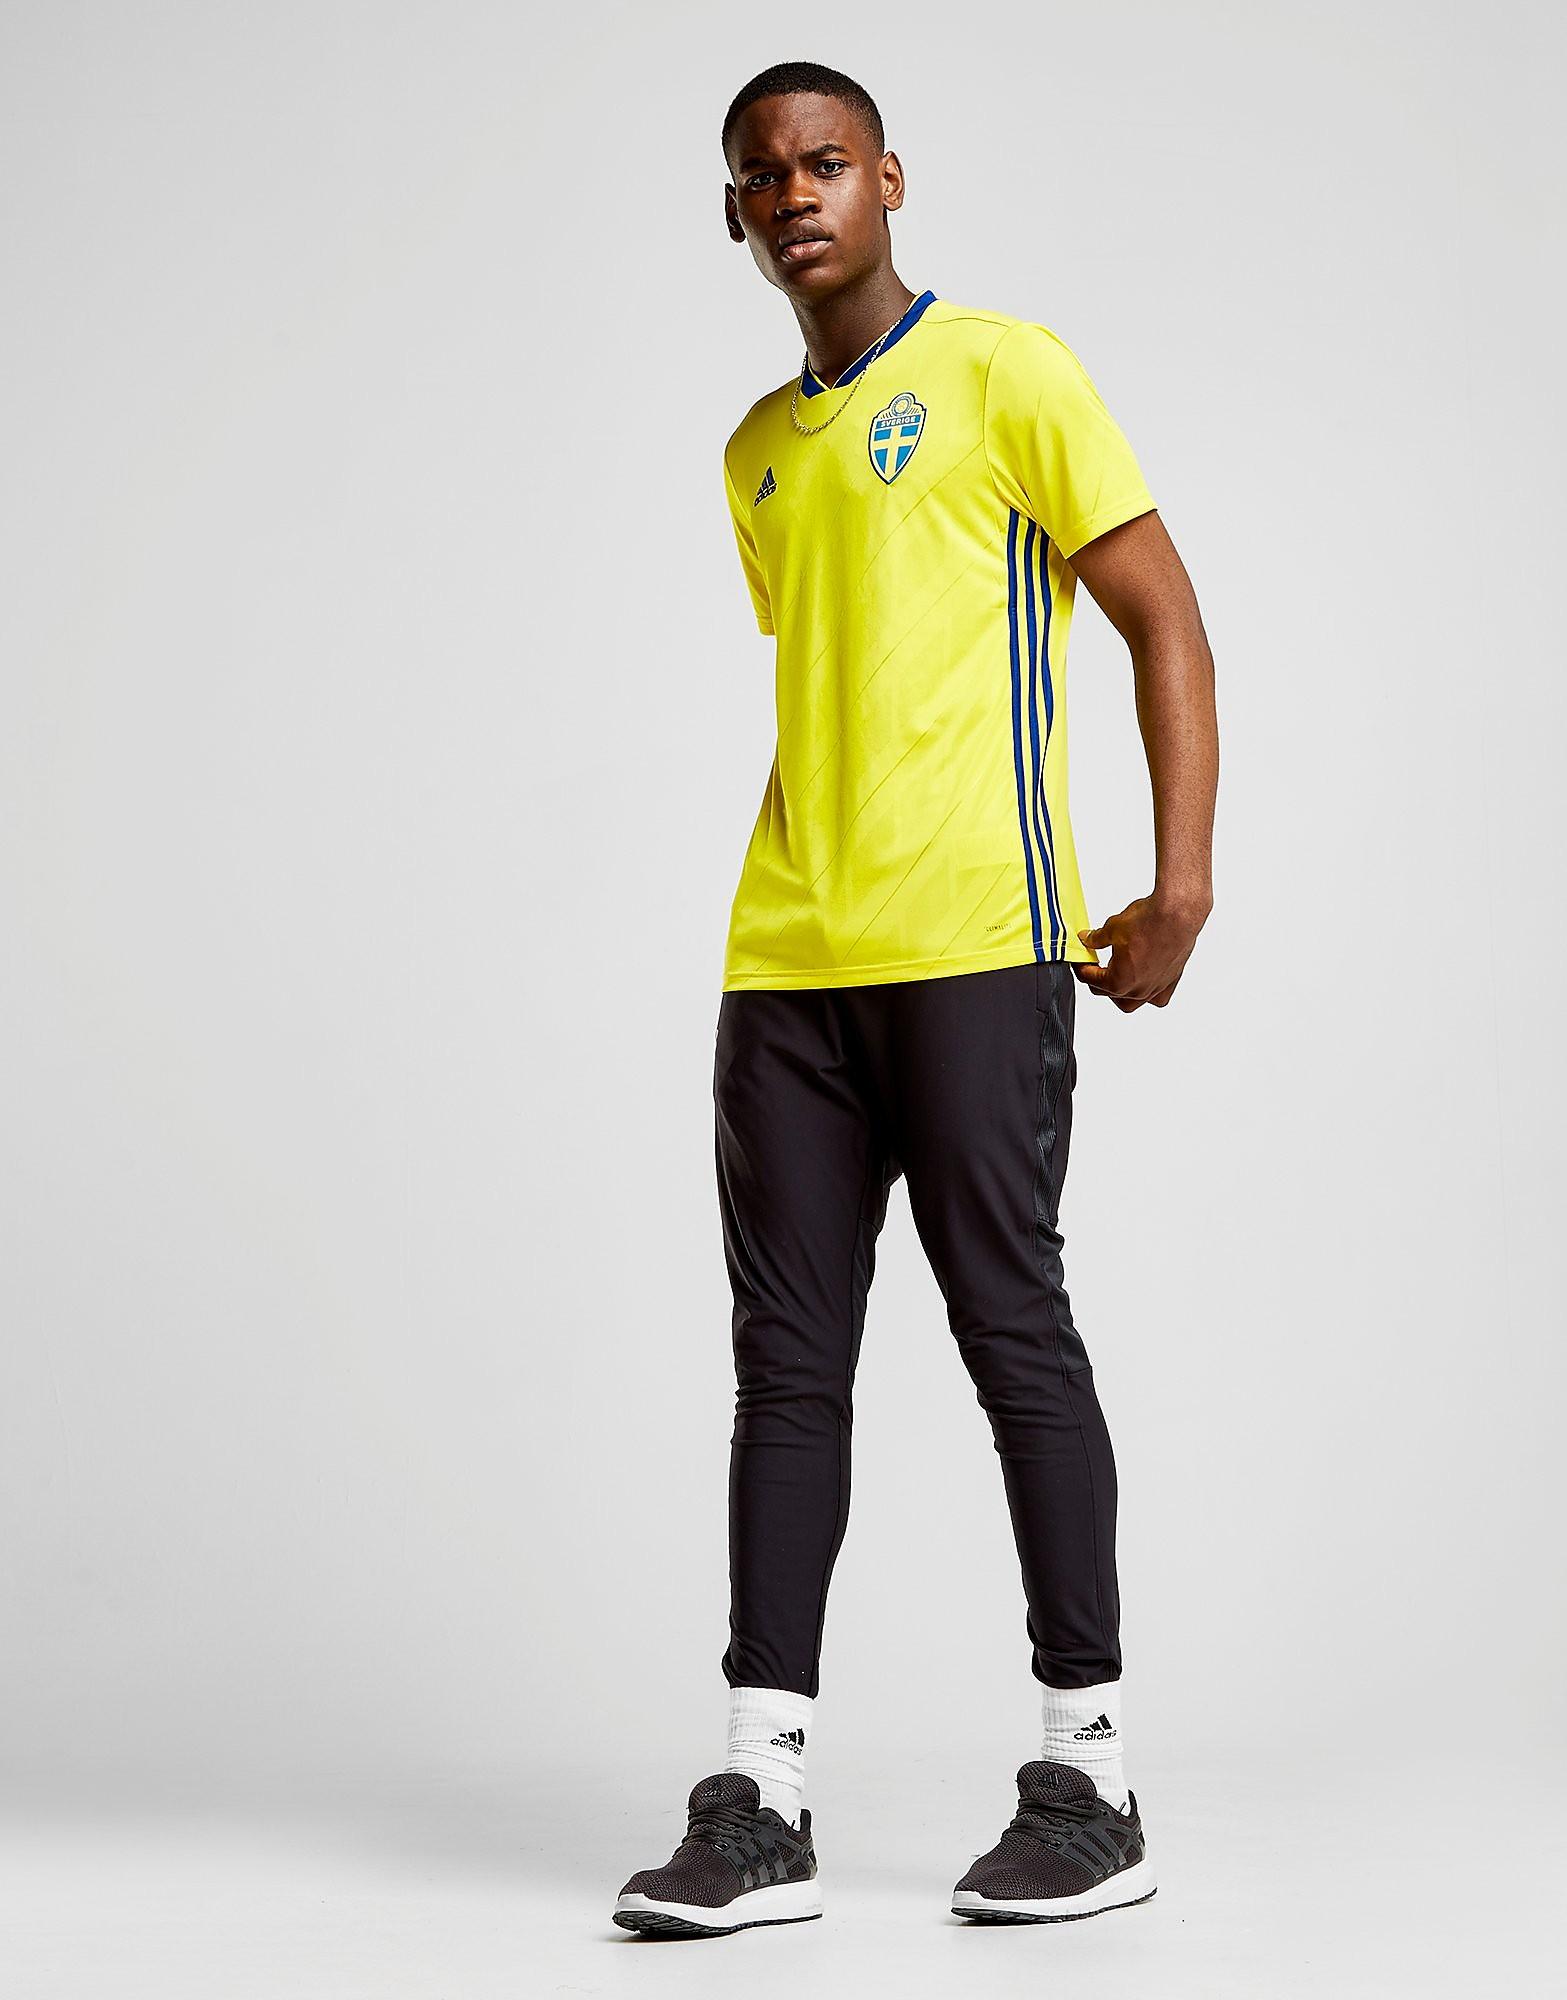 adidas camiseta Suecia 2017/18 1.ª equipación